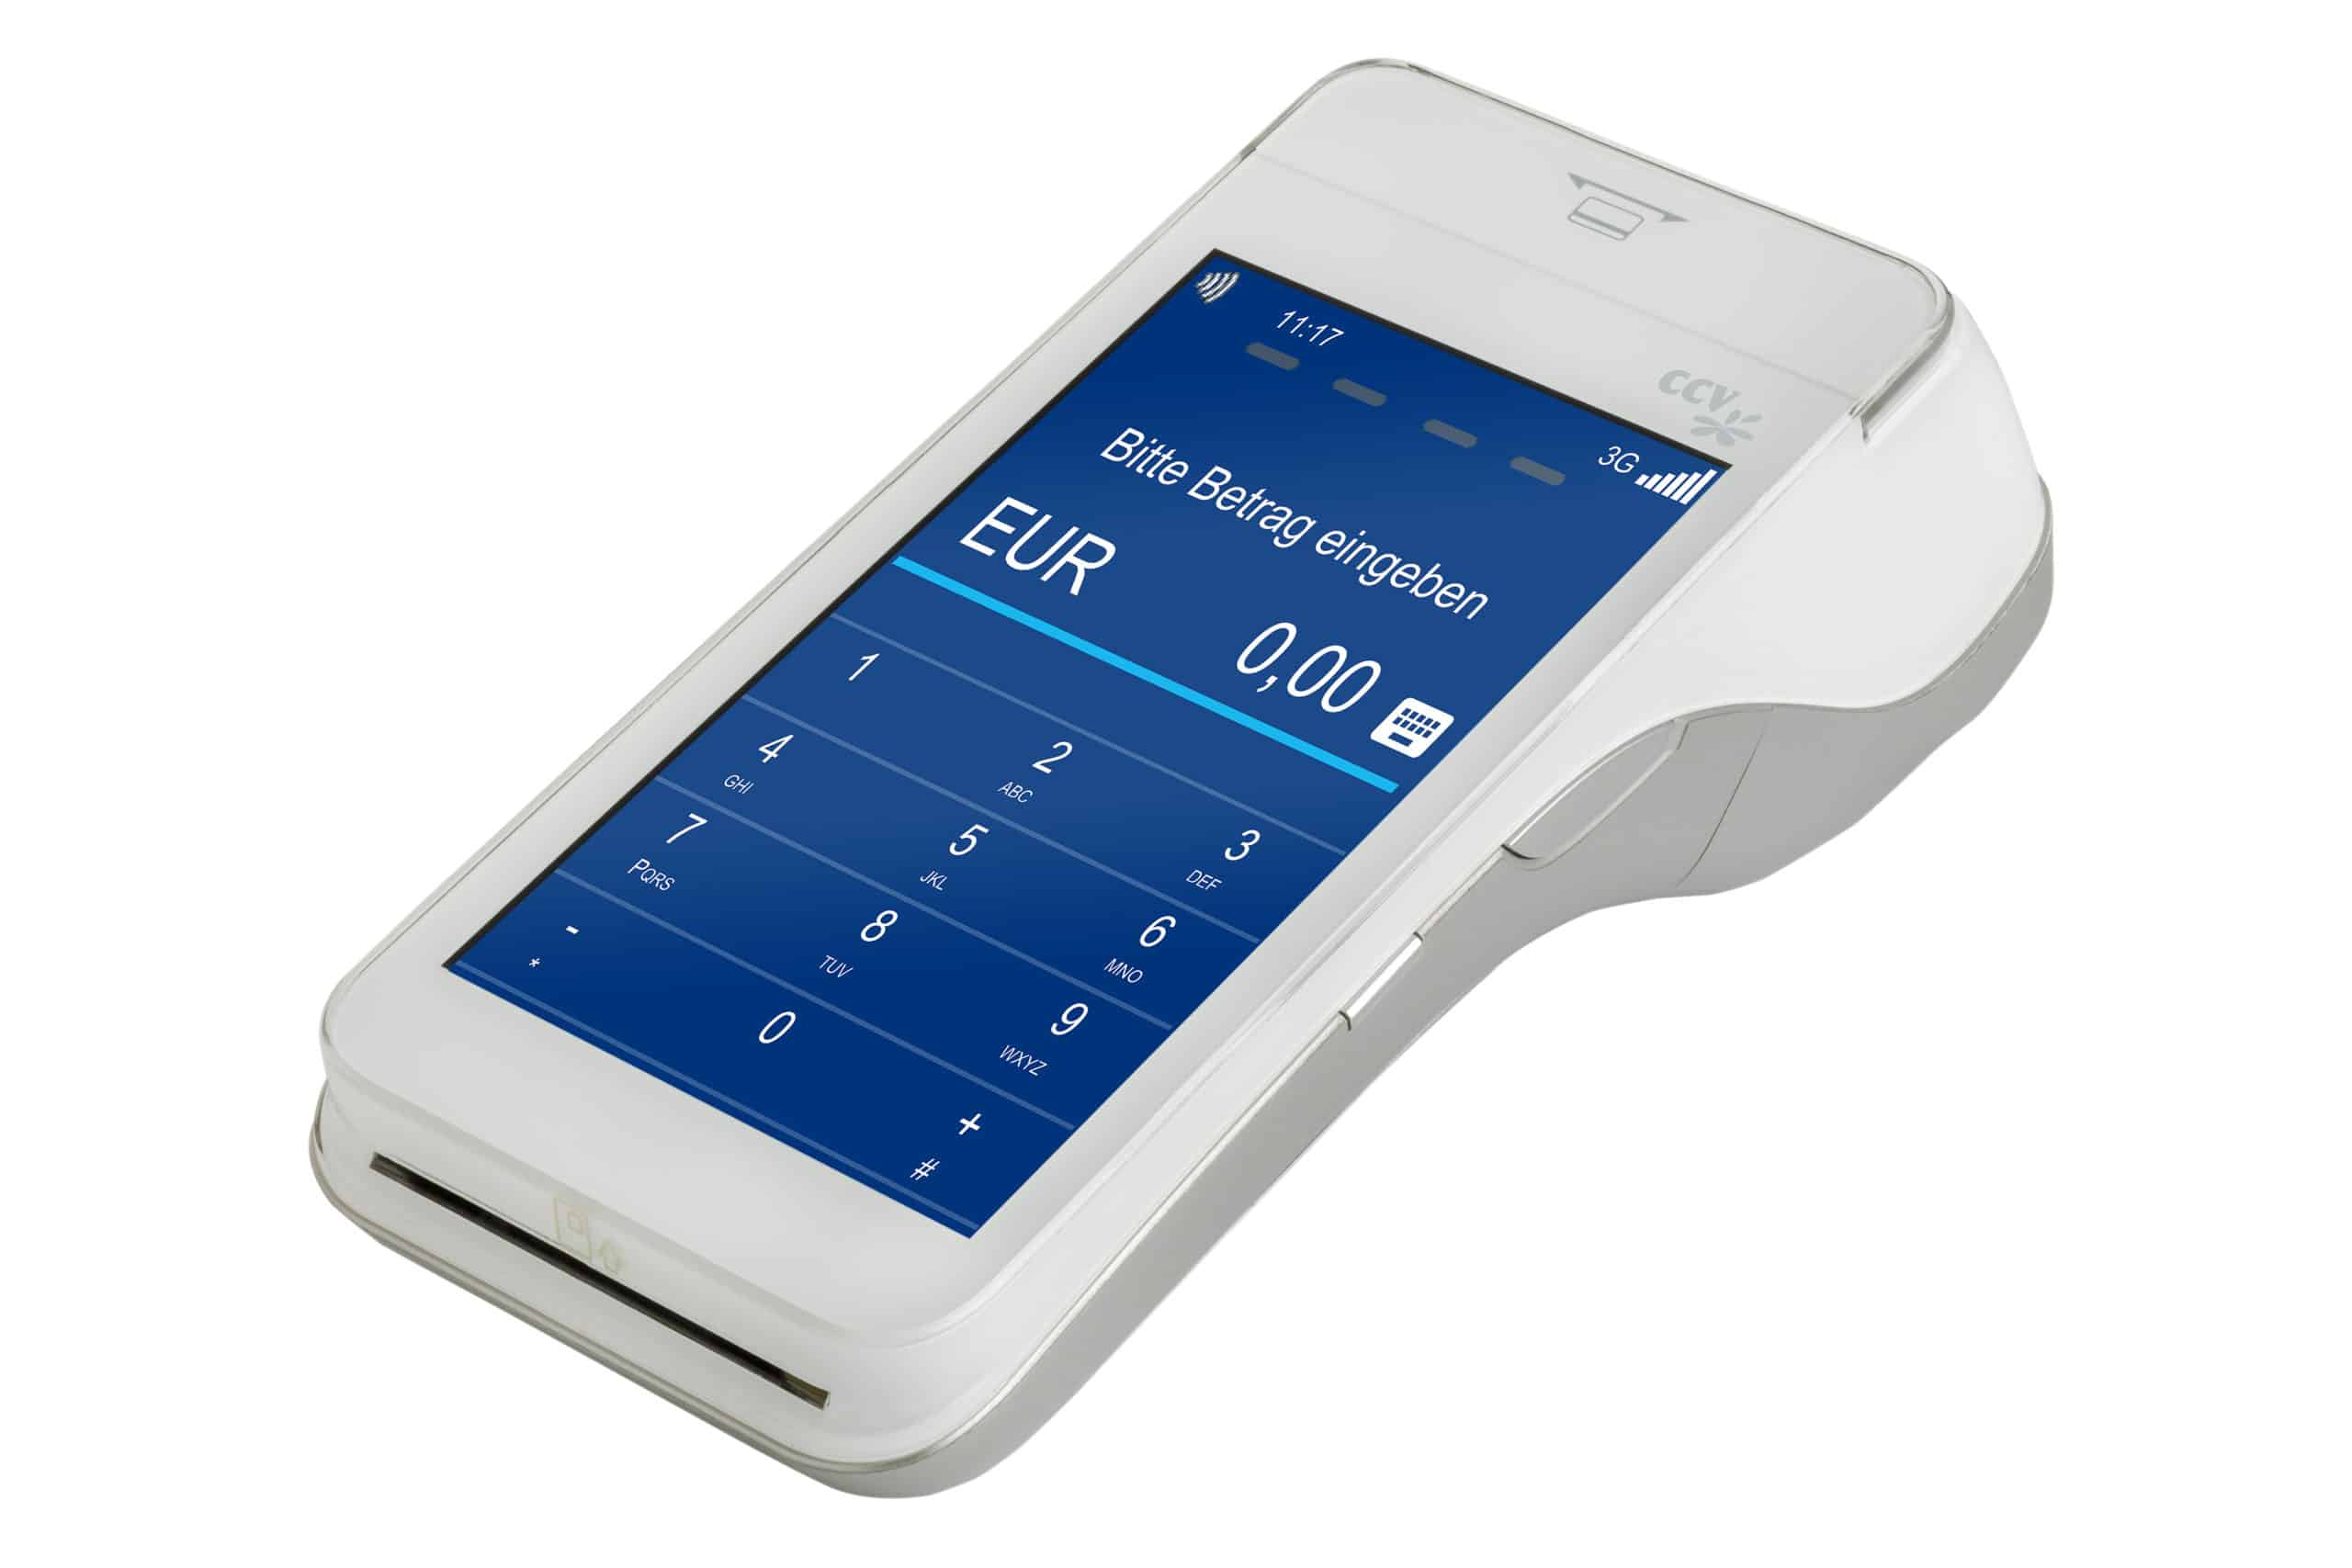 CCV Smart Mobile